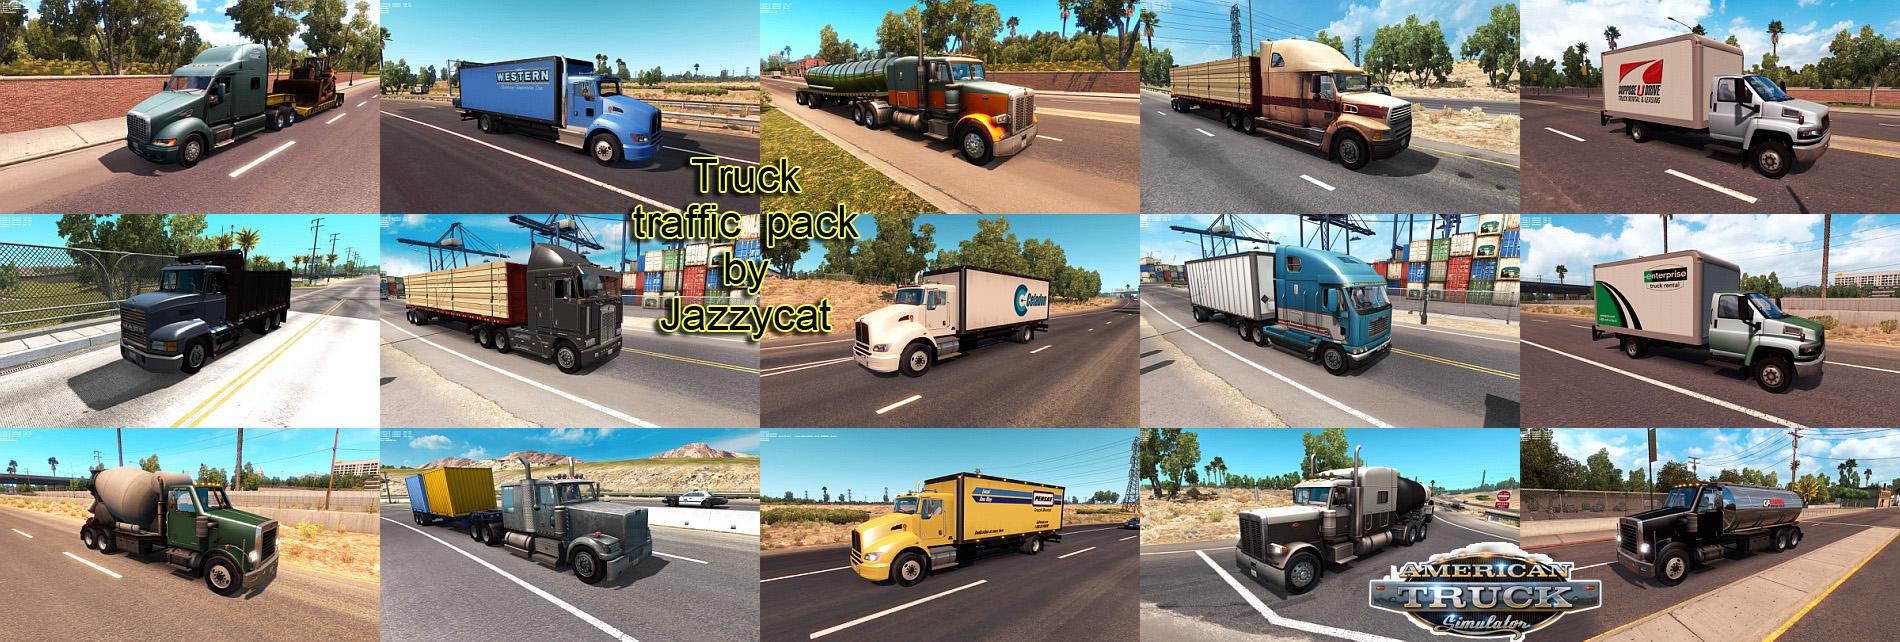 01_truck_traffic_pack_by_Jazzycat_v1.2.jpg